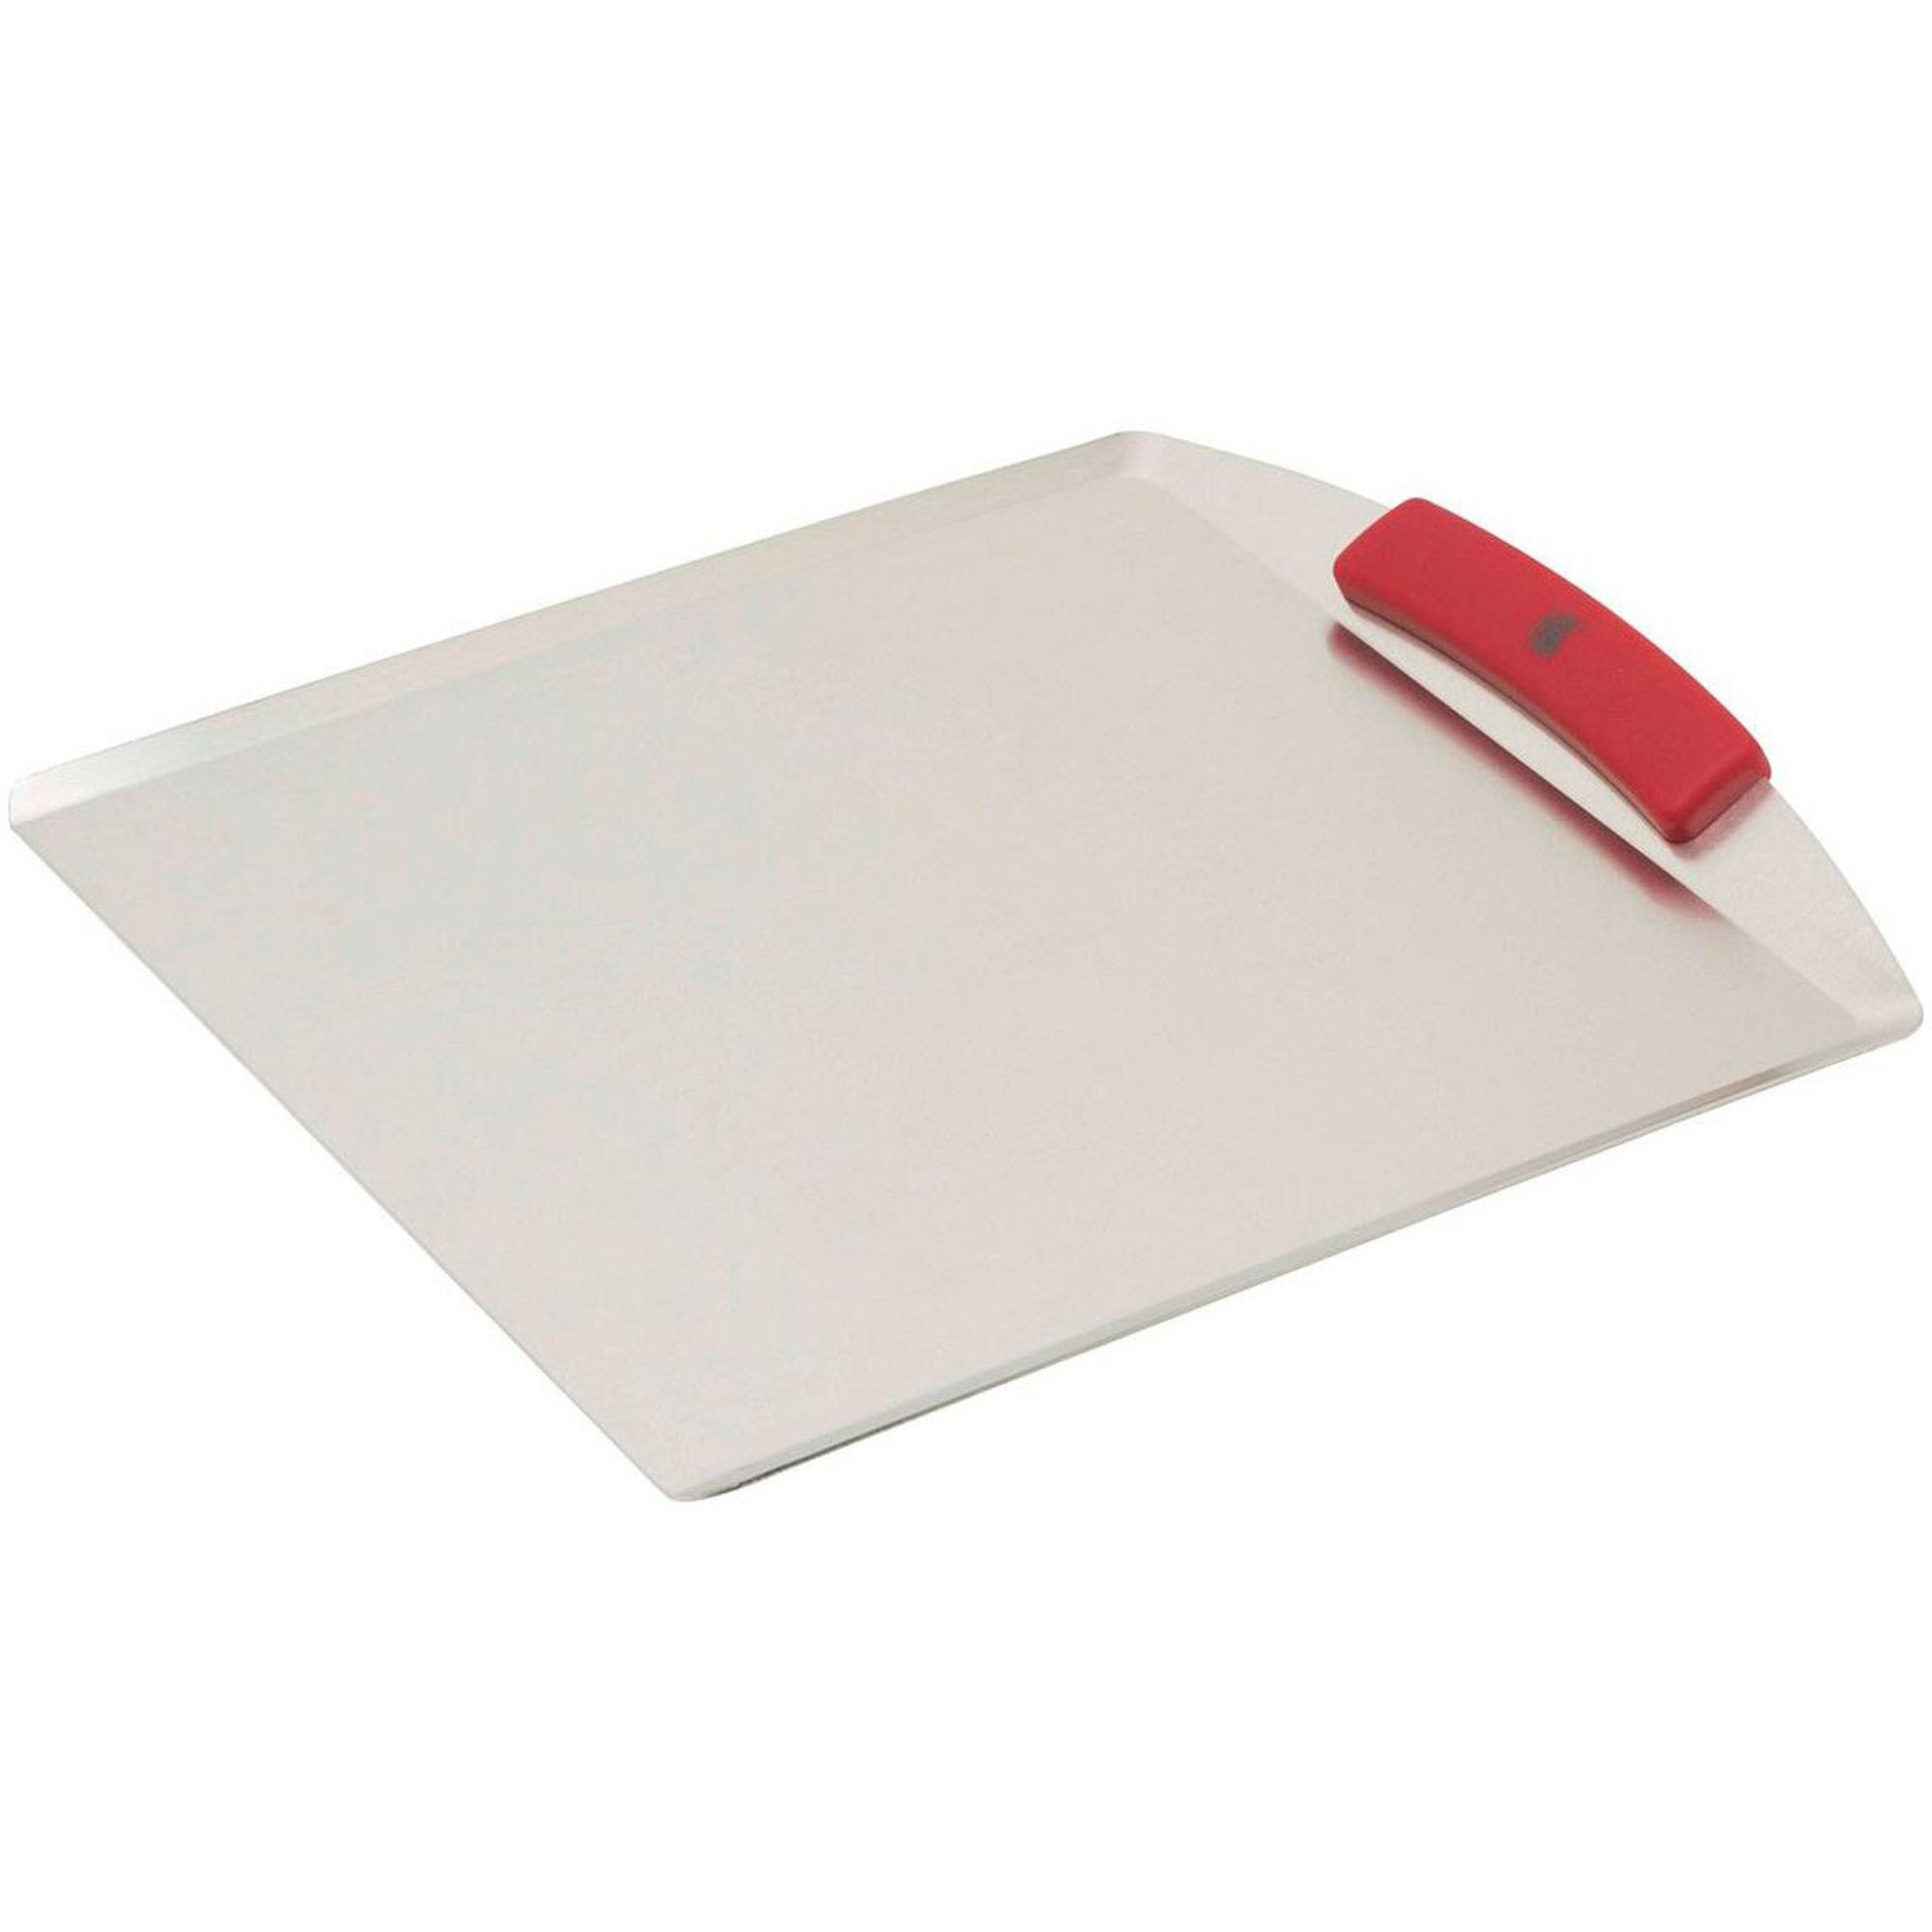 Nordic Ware Kageløfter, rektangulær